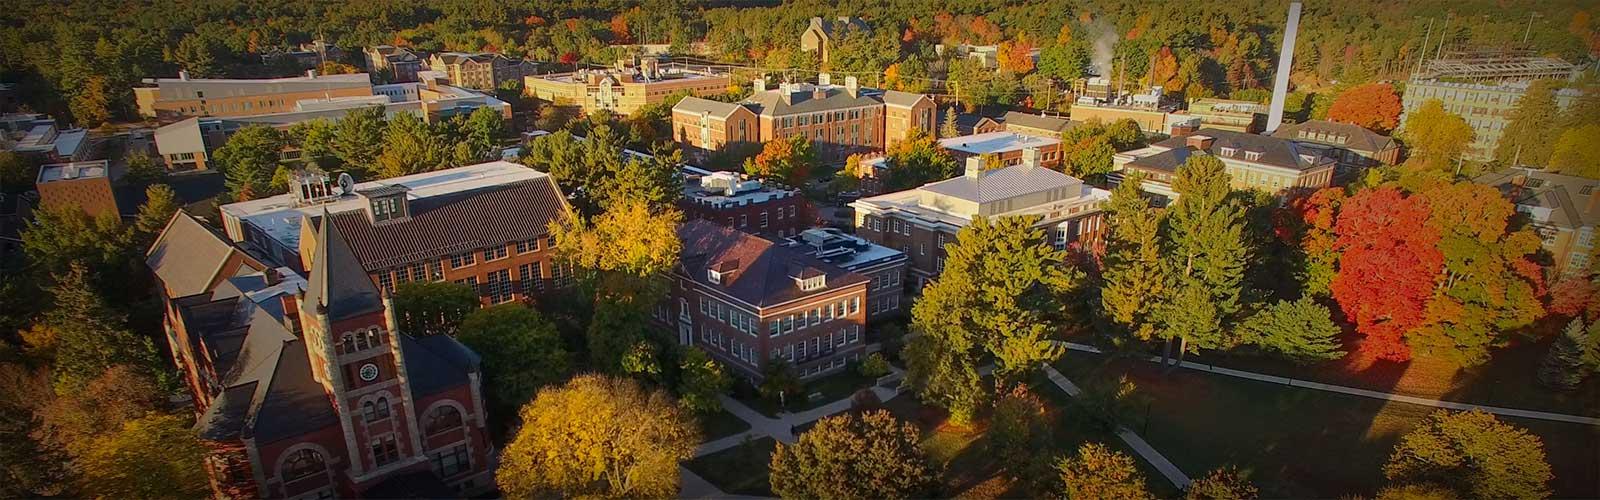 unh campus aerial shot